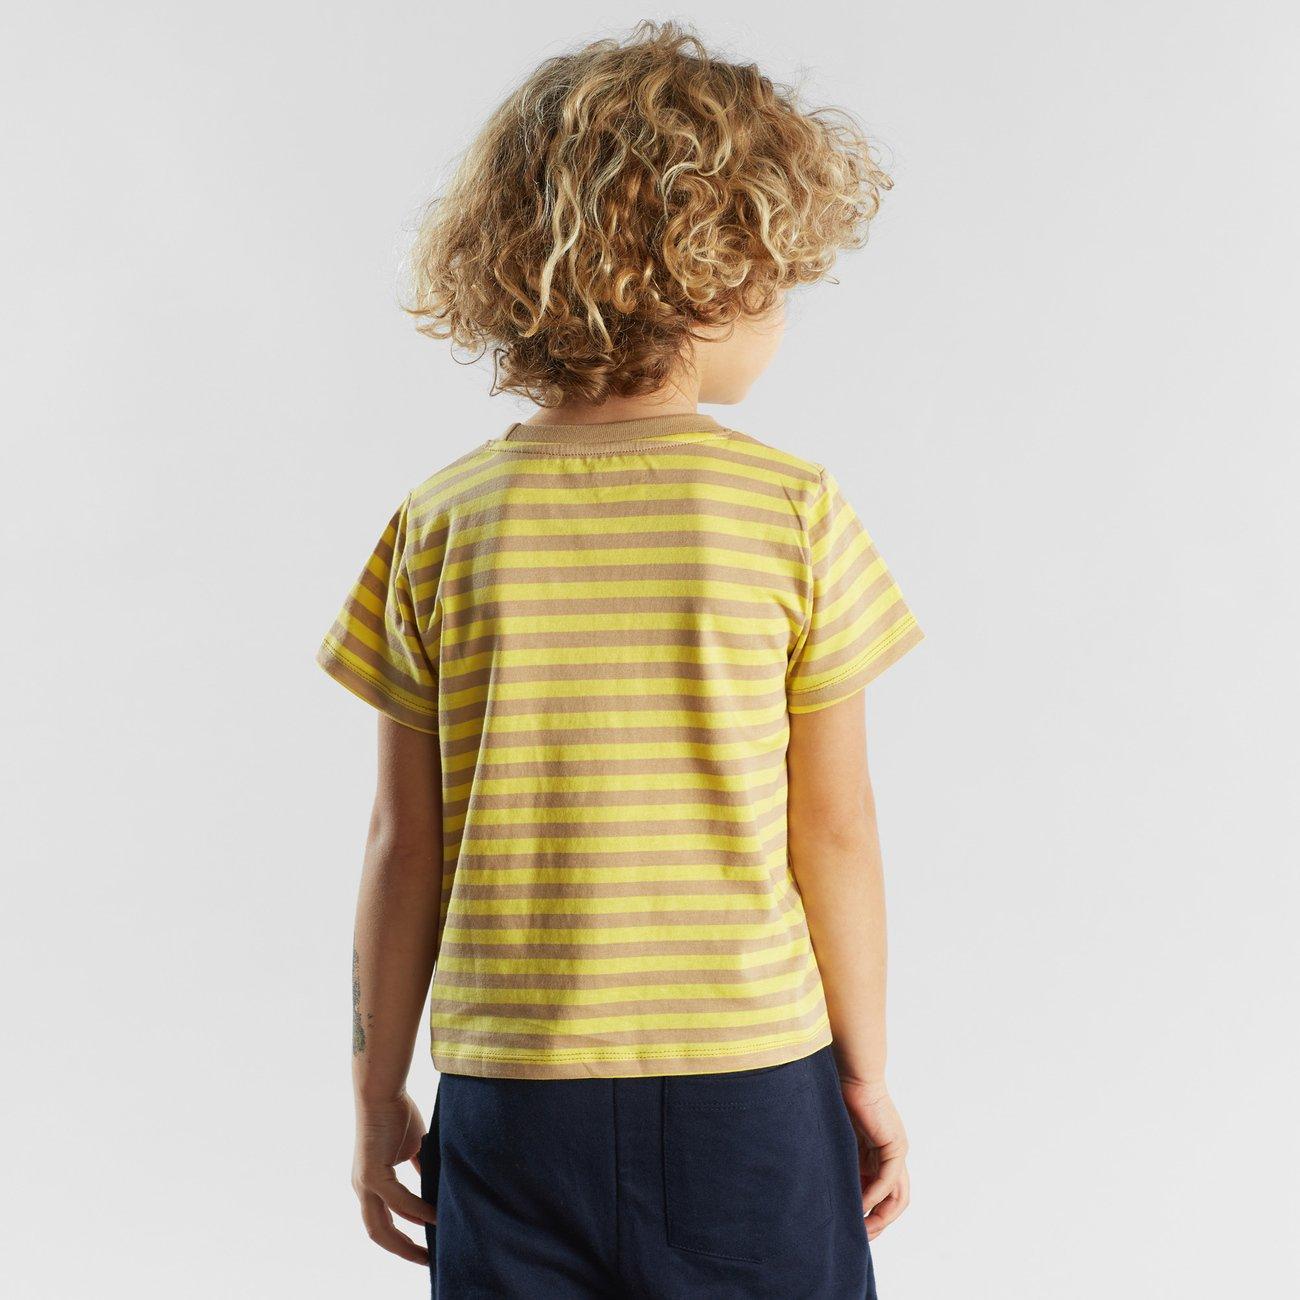 T-shirt Hamra Stripes Yellow